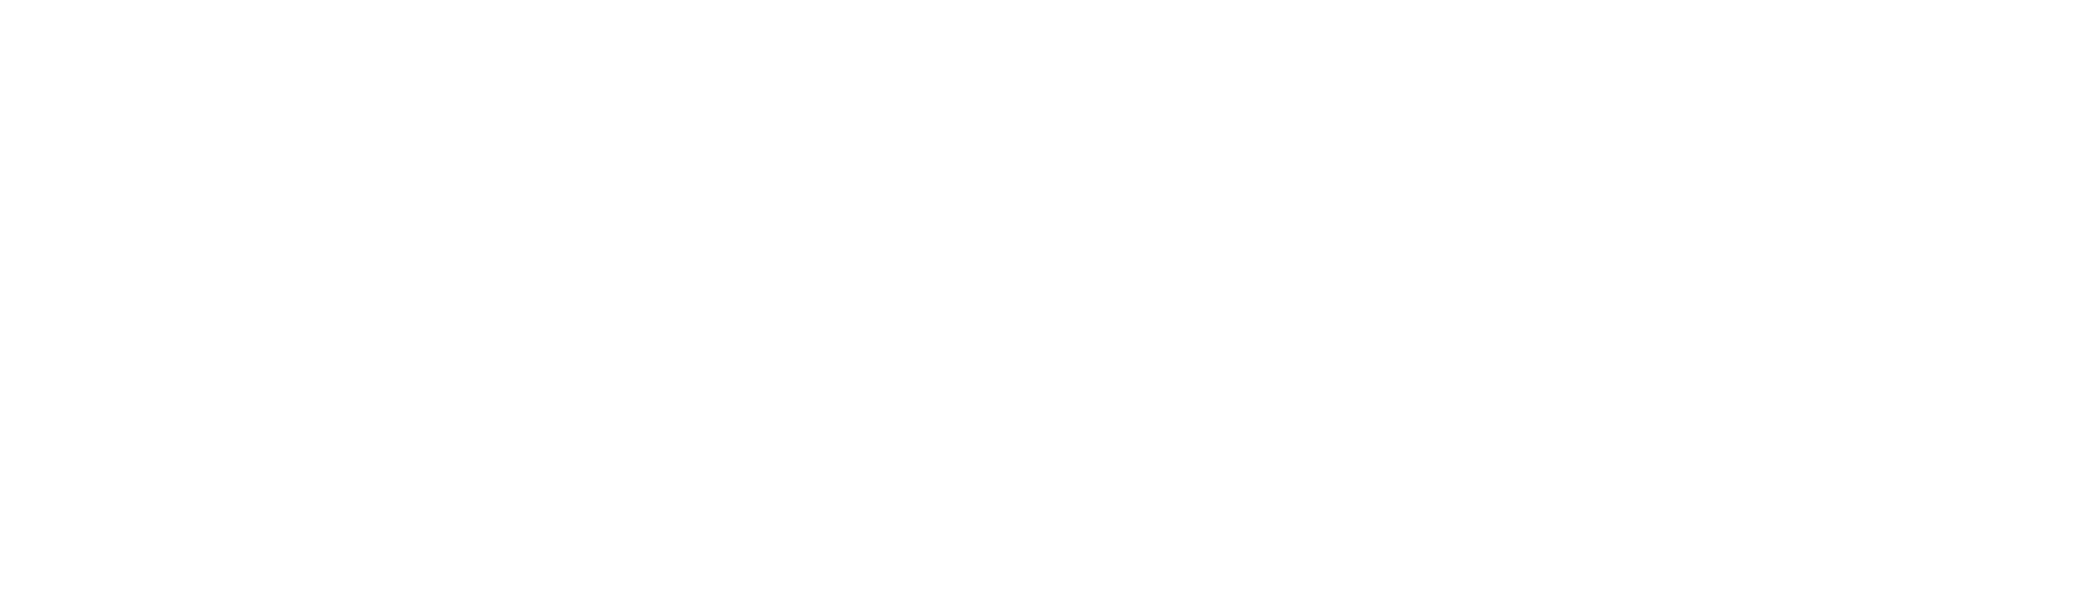 bcstech-placeholder